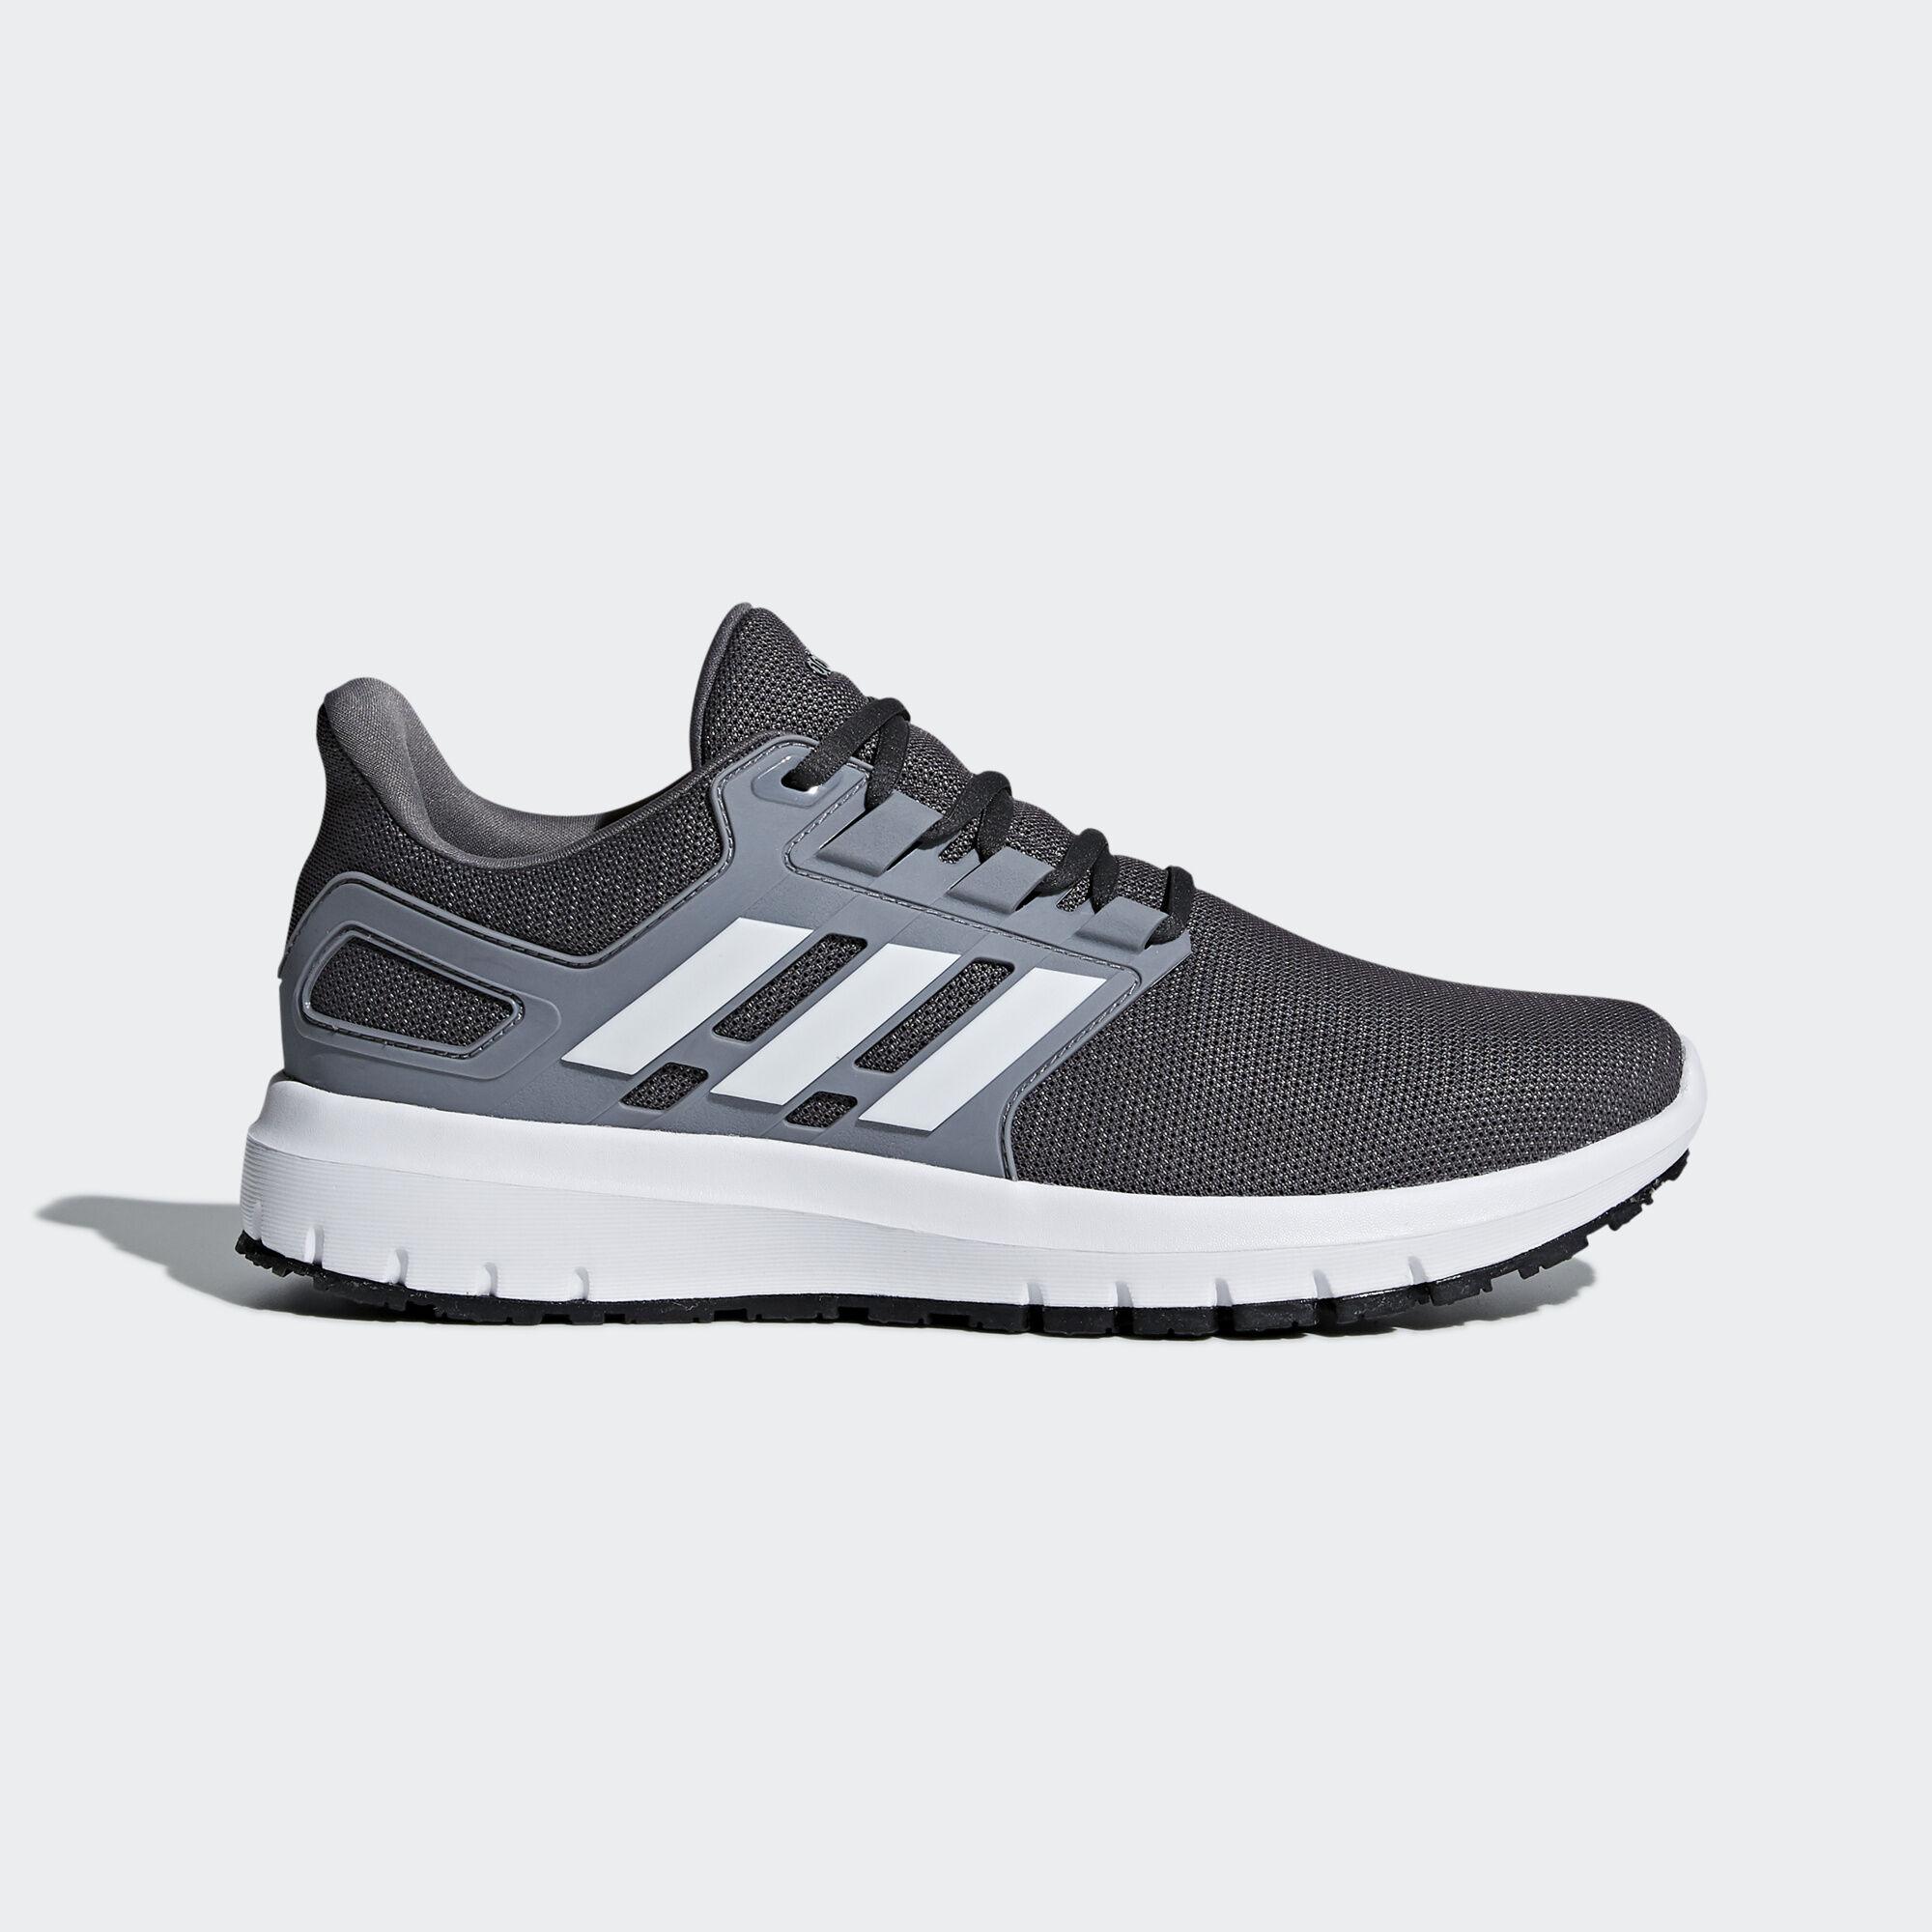 size 40 0dcc4 7b06f adidas - Energy Cloud 2 Shoes Grey Five  Ftwr White  Grey B44751